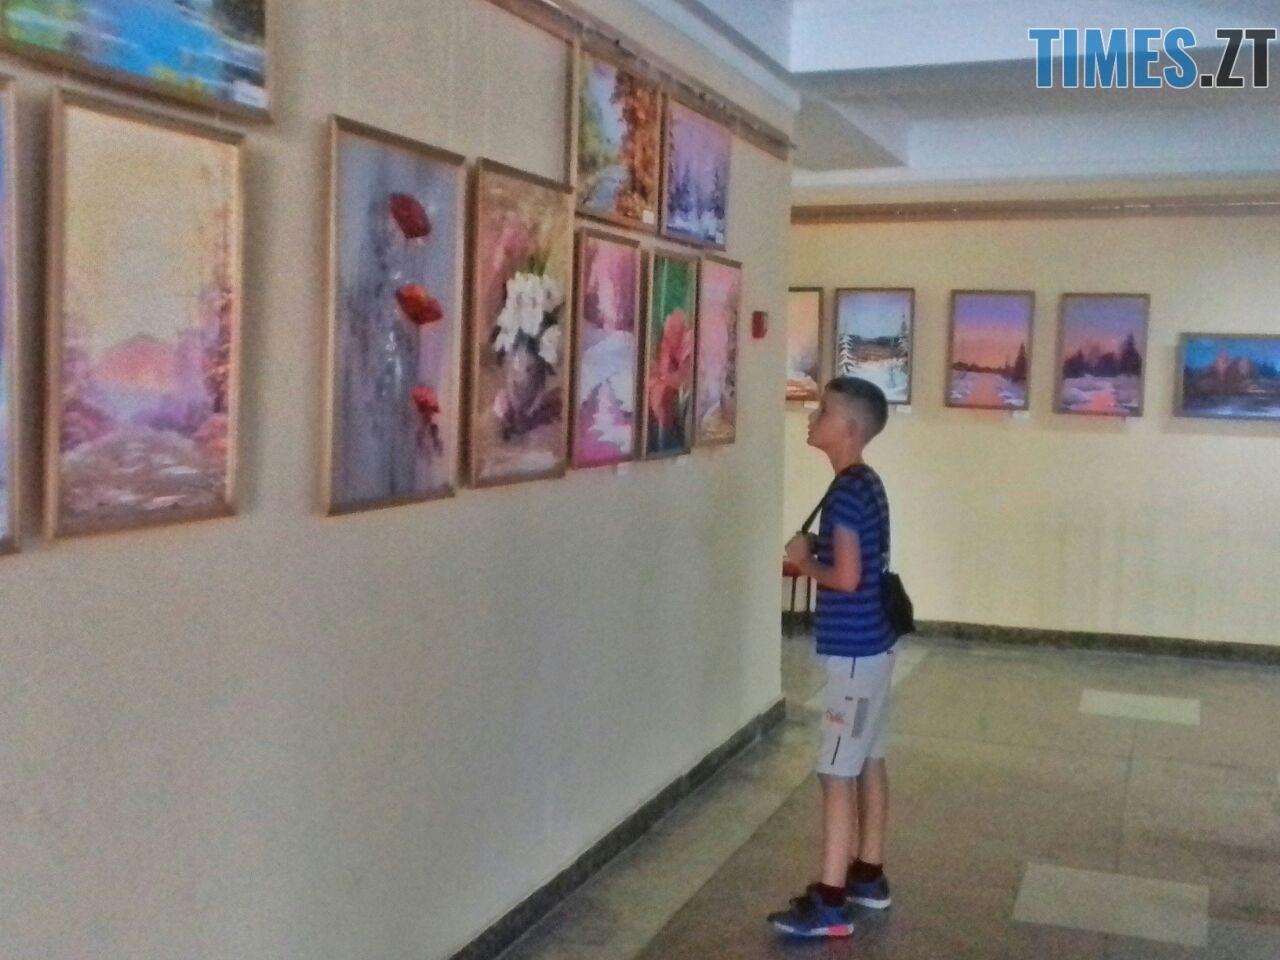 WhatsApp Image 2018 09 01 at 12.12.50 1 - Мистецтво нашвидкуруч: митець показав, як намалювати картину за 20 хвилин (ФОТО)